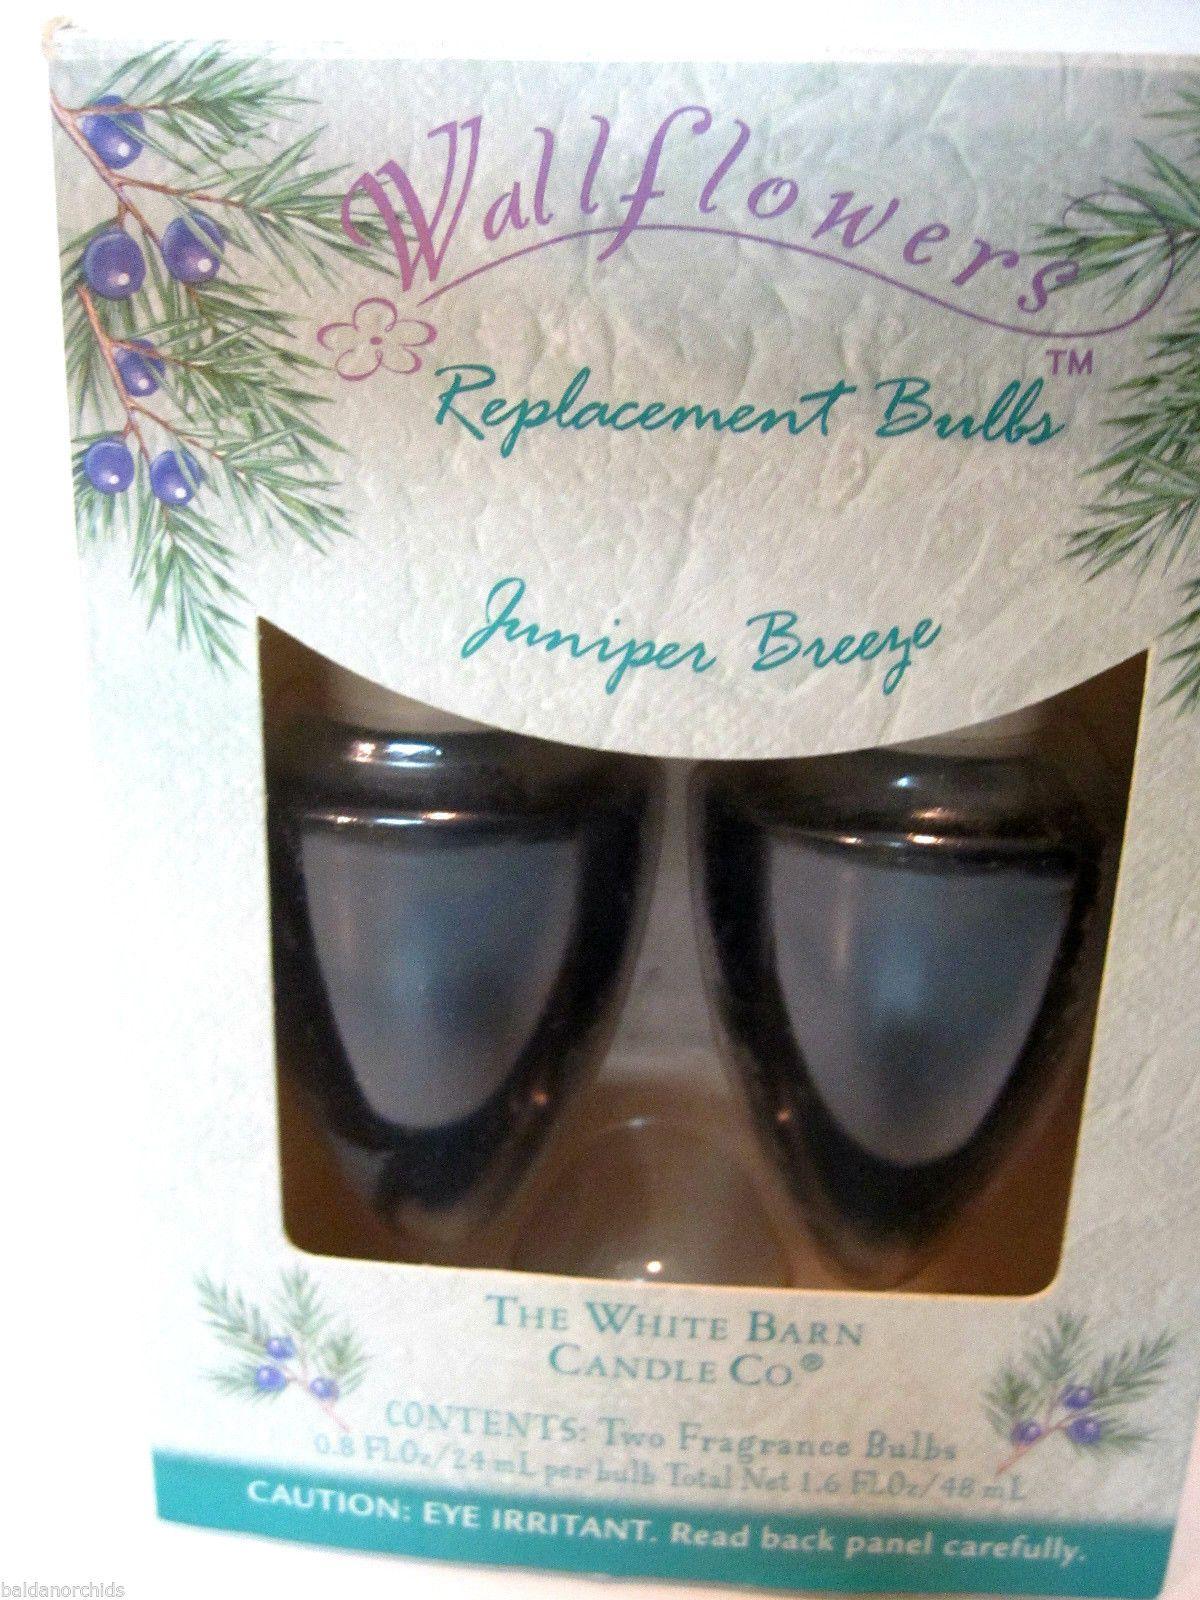 White Barn Candle Co Juniper Breeze Wallflower Refill Fragrance Bulbs